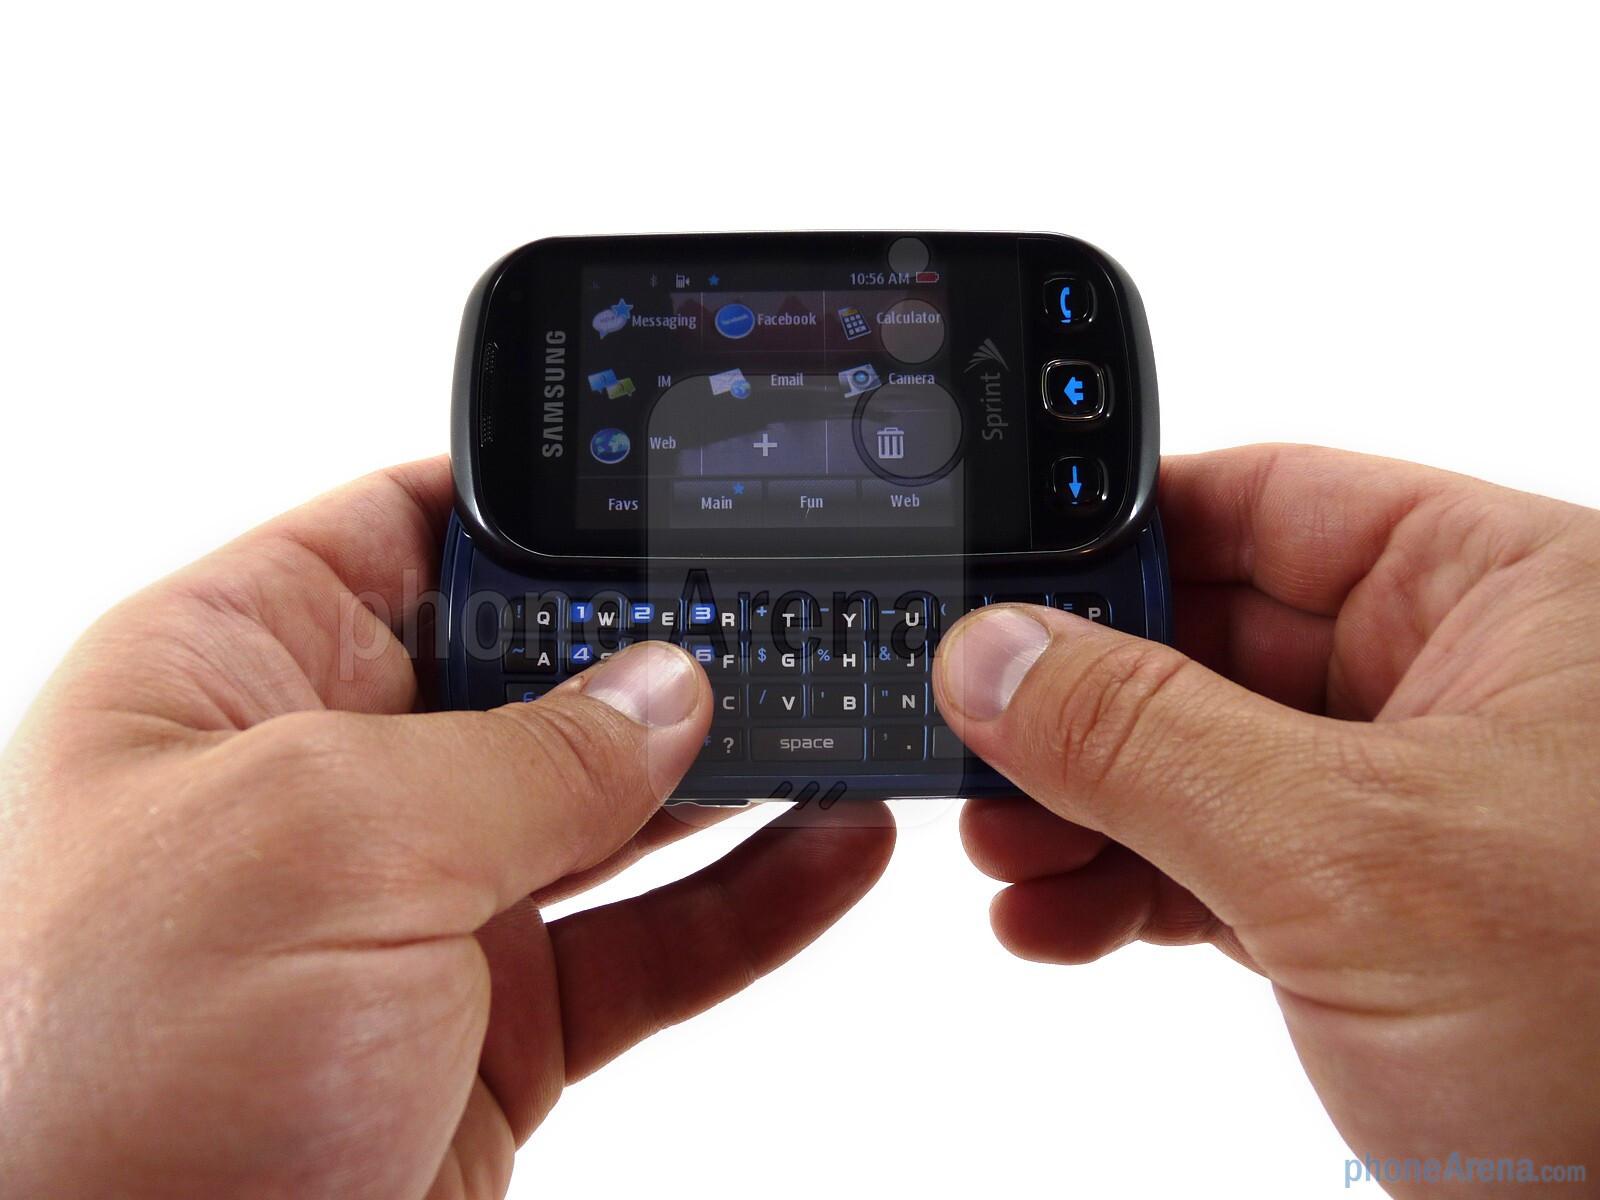 The Samsung Seek M350 is a